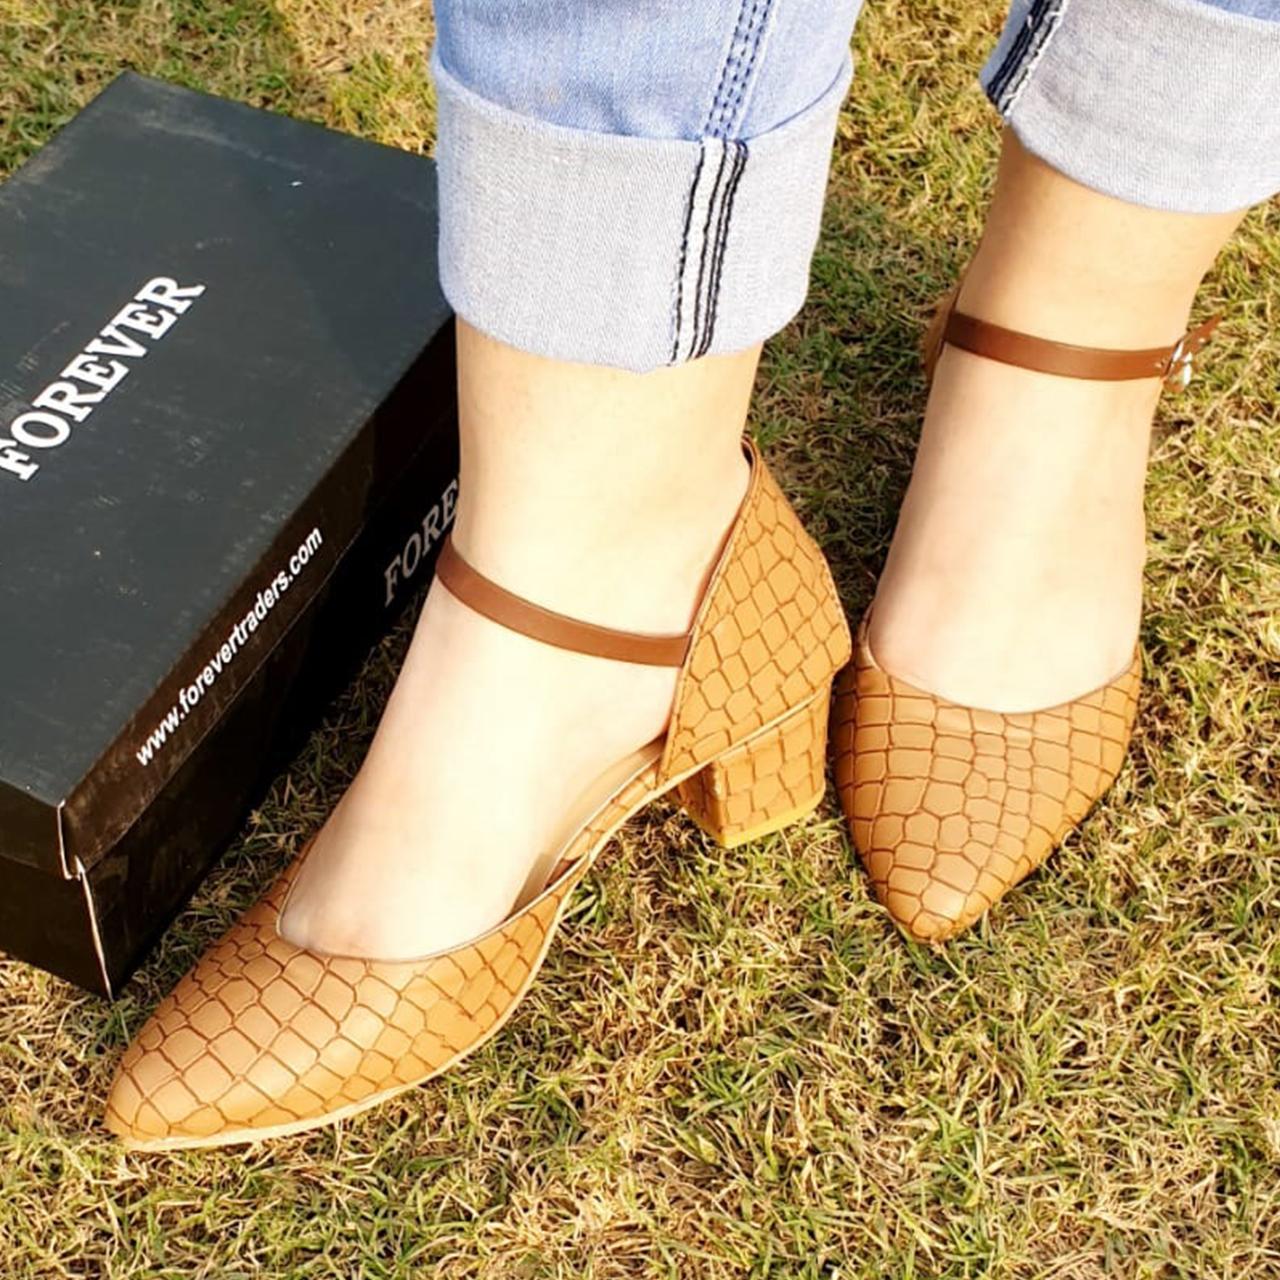 Almond Toe Heeled Sandals for Women FR8-66